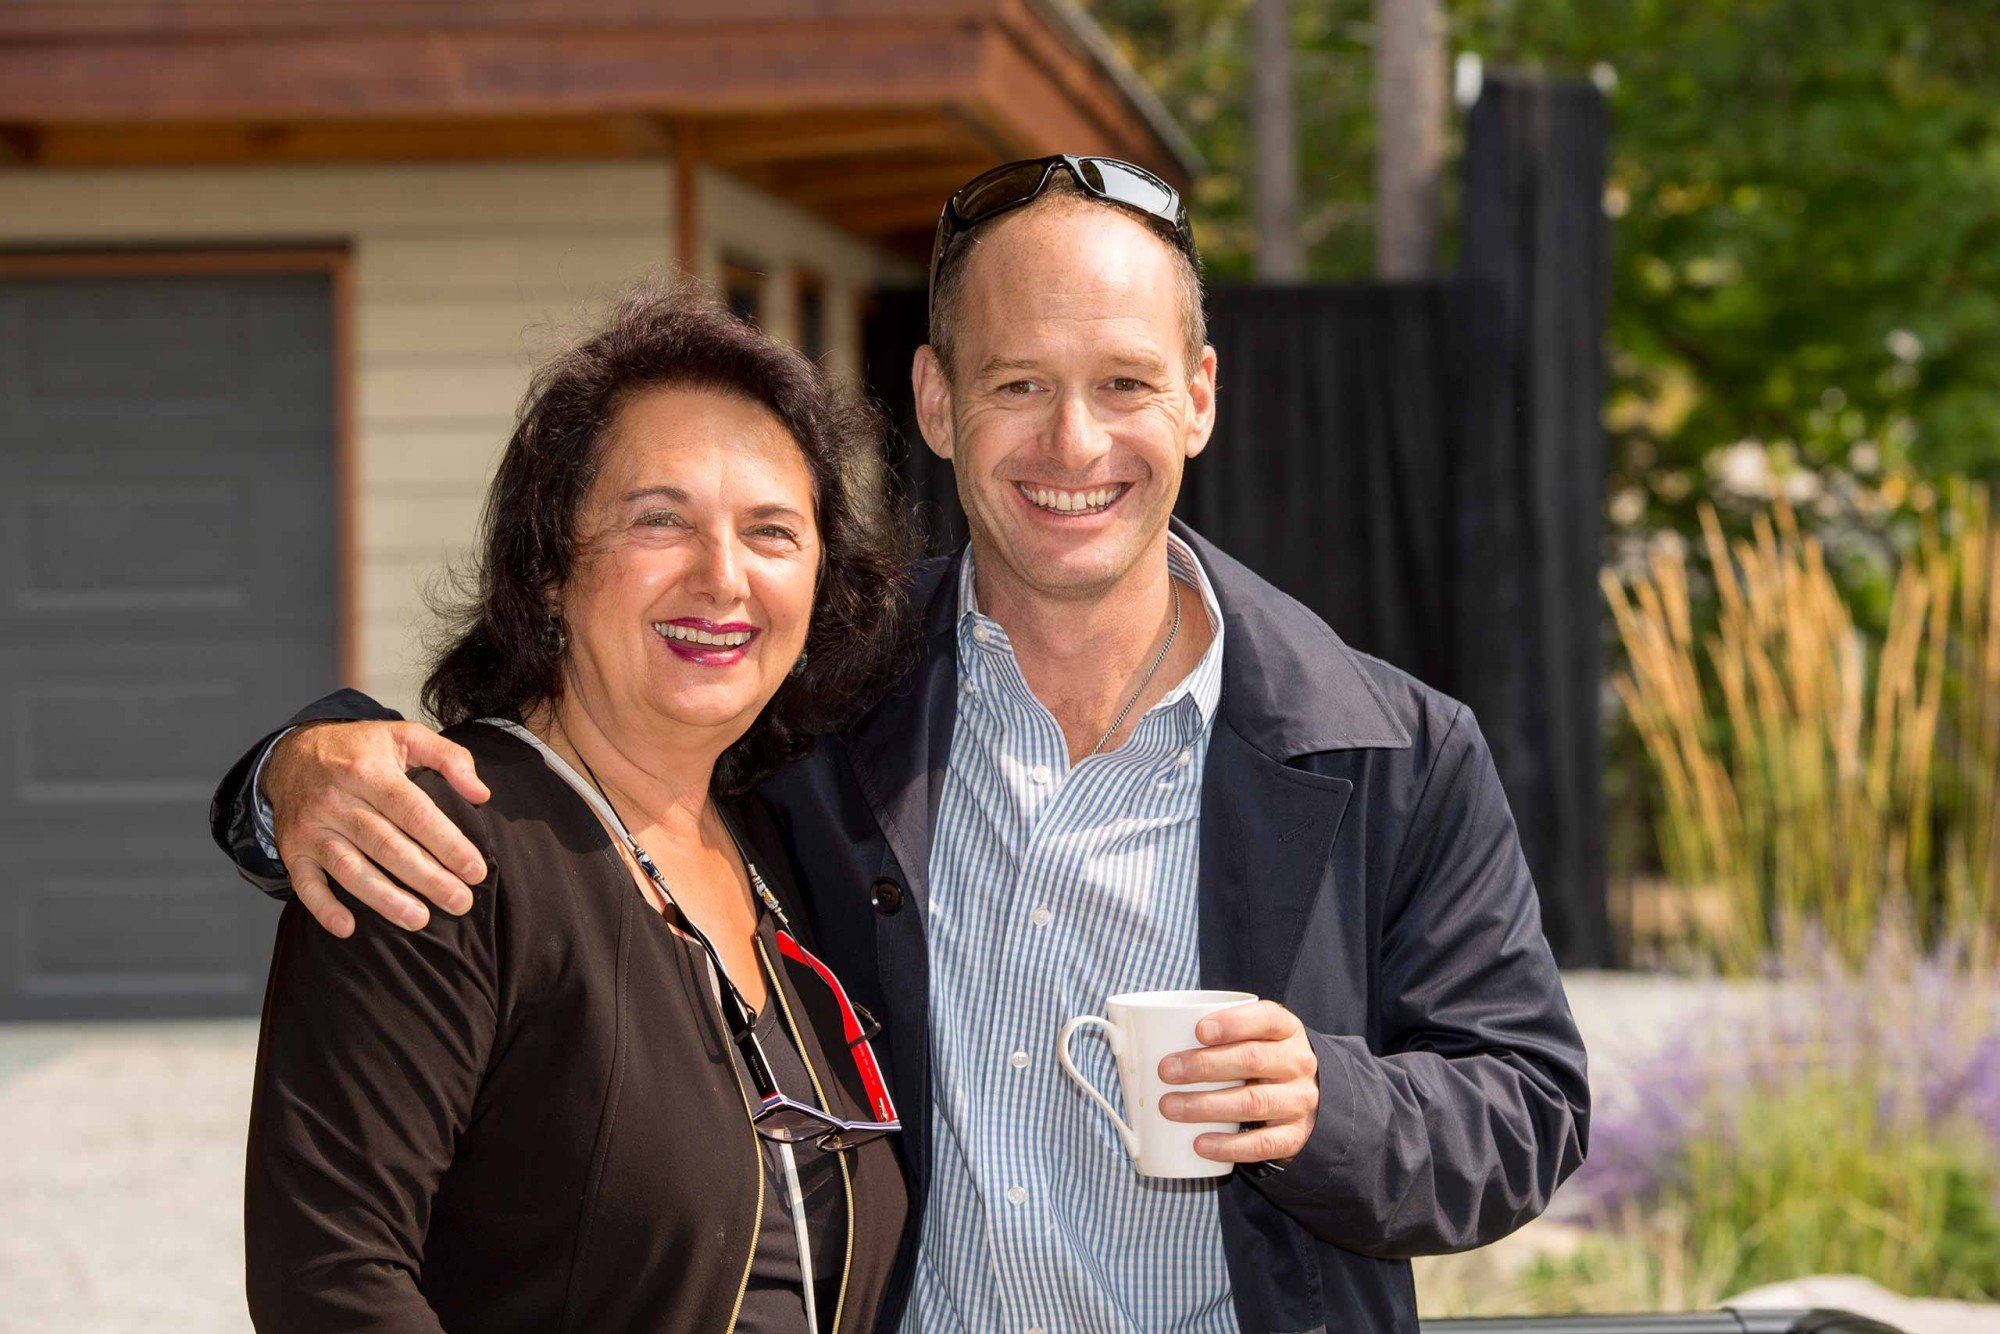 Jane Hoffman and Alec Lambert real estate auction